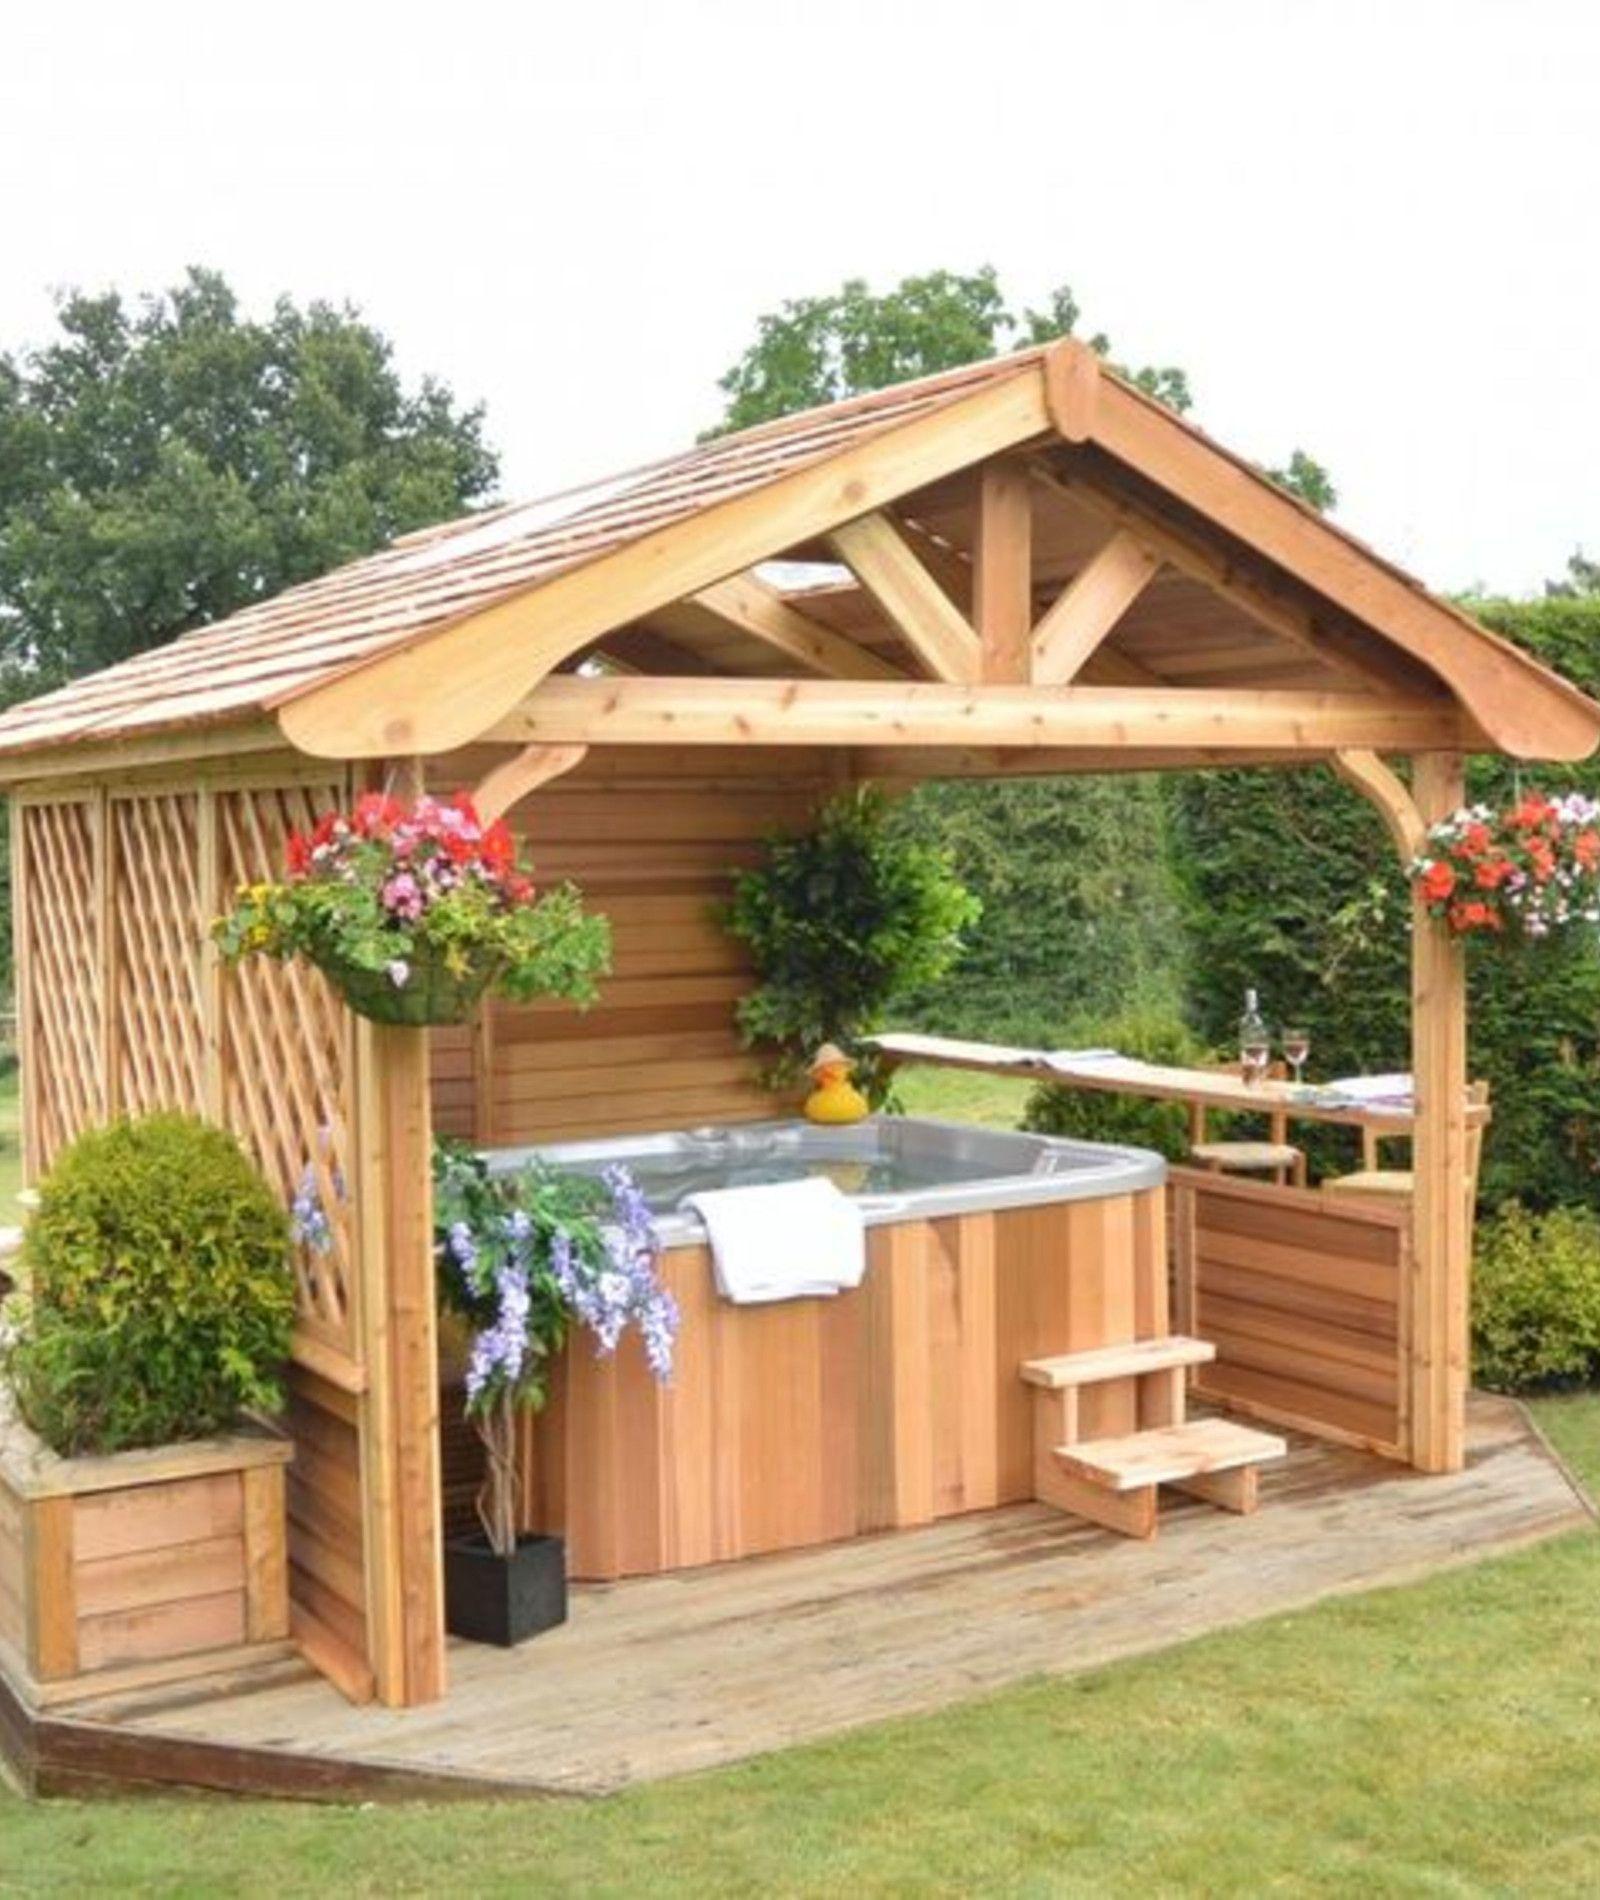 Backyard Hot Tub Ideas Portableshedplan Hot Tub Landscaping Hot Tub Garden Hot Tub Backyard